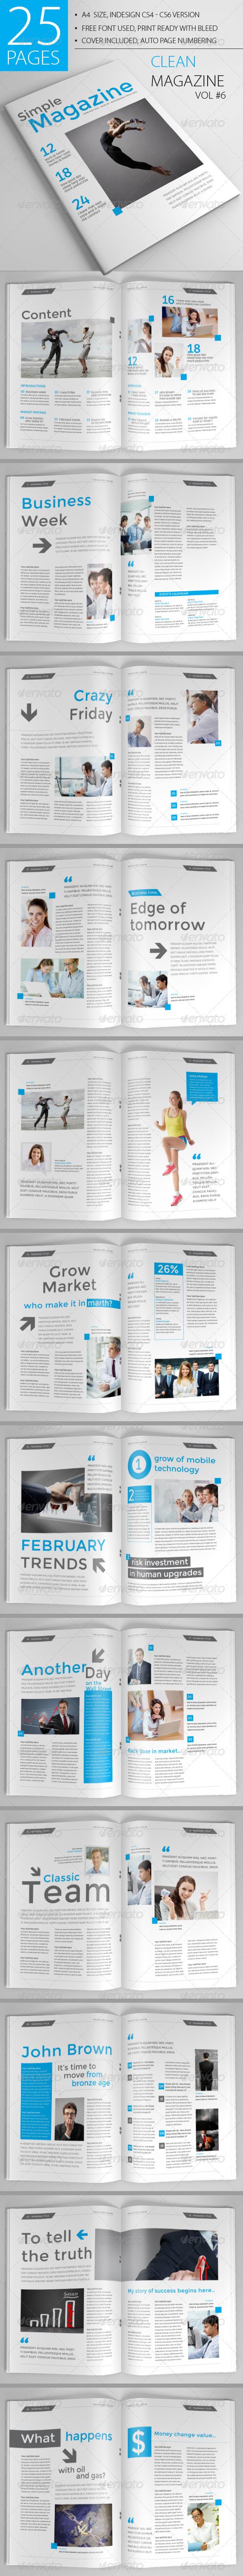 GraphicRiver 25 Pages Clean Magazine Vol6 6847207